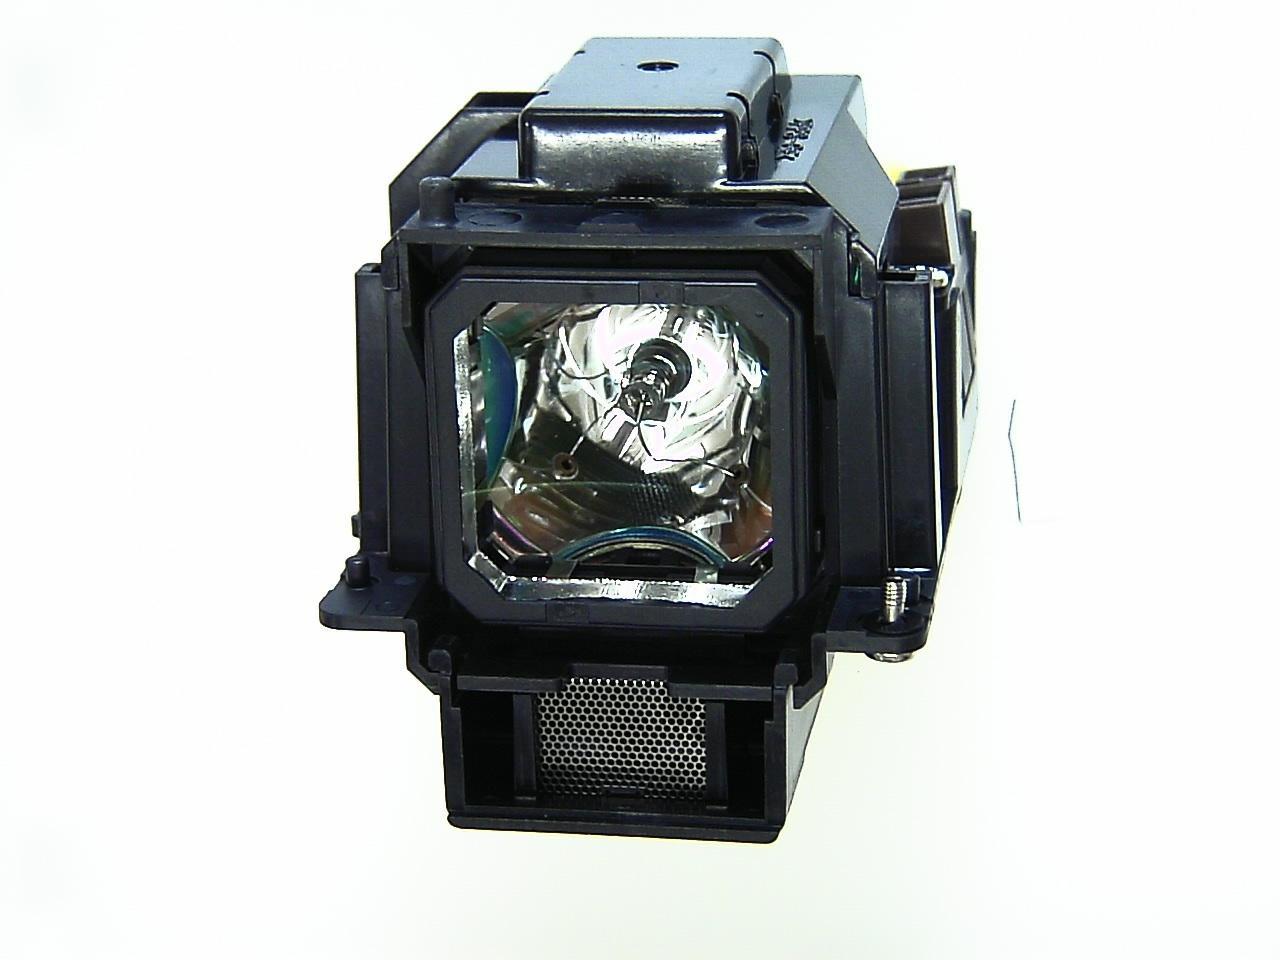 Lámpara ANDERS KERN DXL 7025